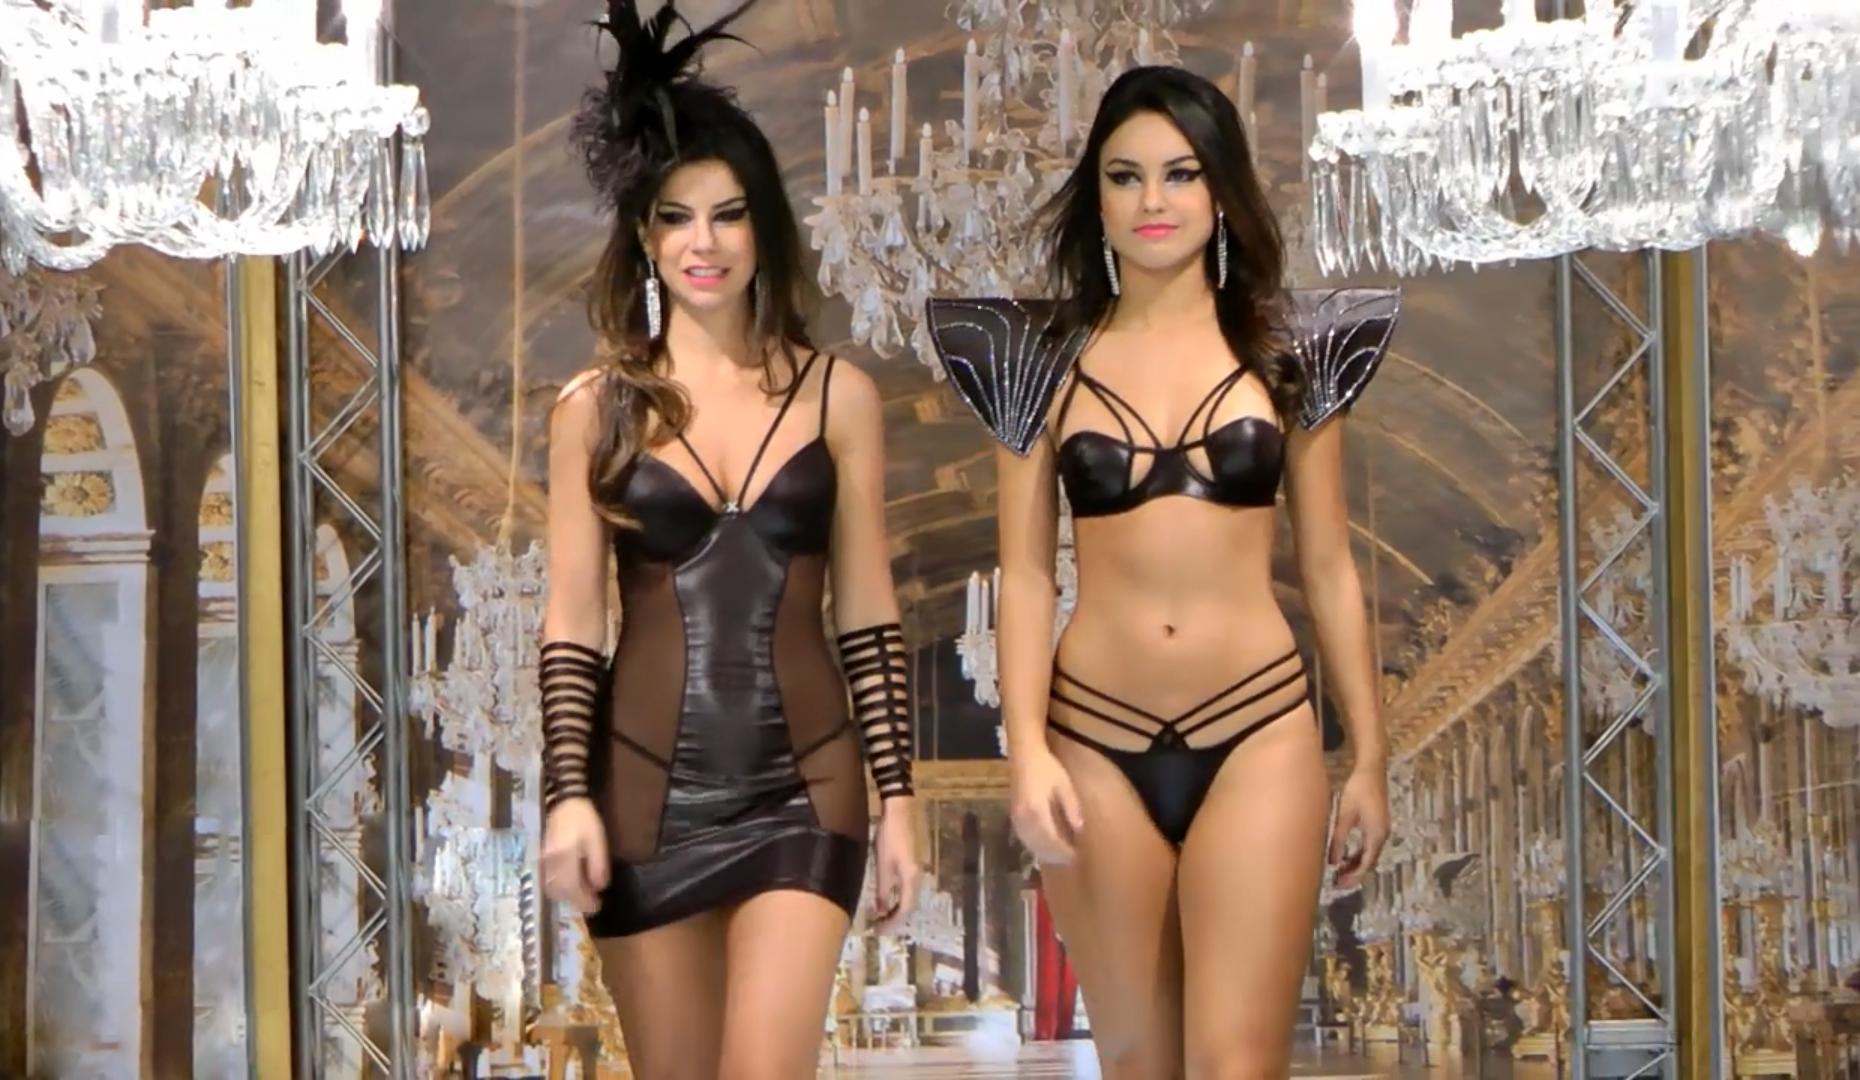 Salao Moda. Desfile de lingerie. Underwear fashion